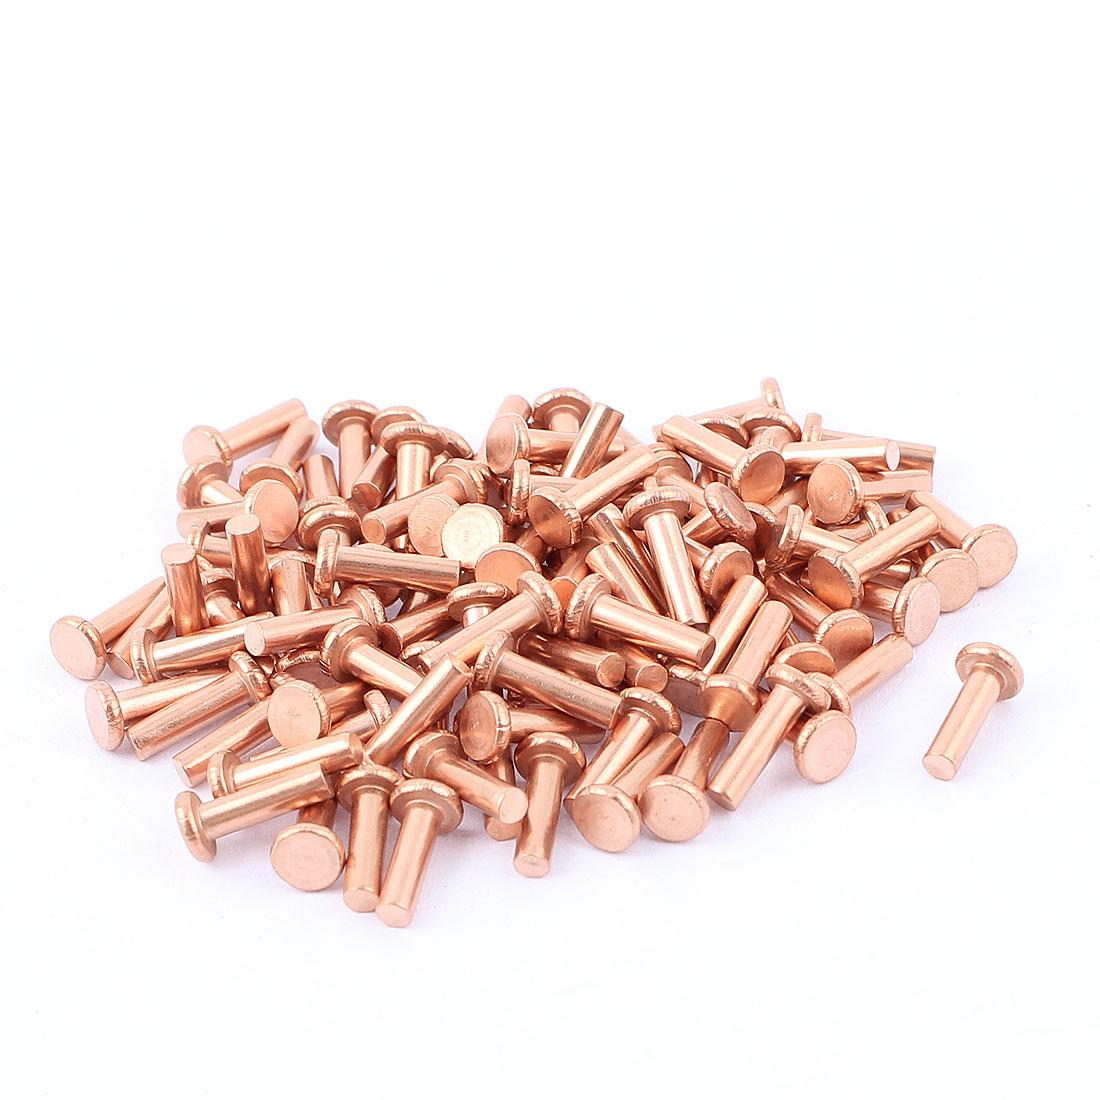 "100 Pcs 1/8"" Diameter 25/64"" Long Shank Flat Head Bolts Copper Solid Rivets Fasteners"